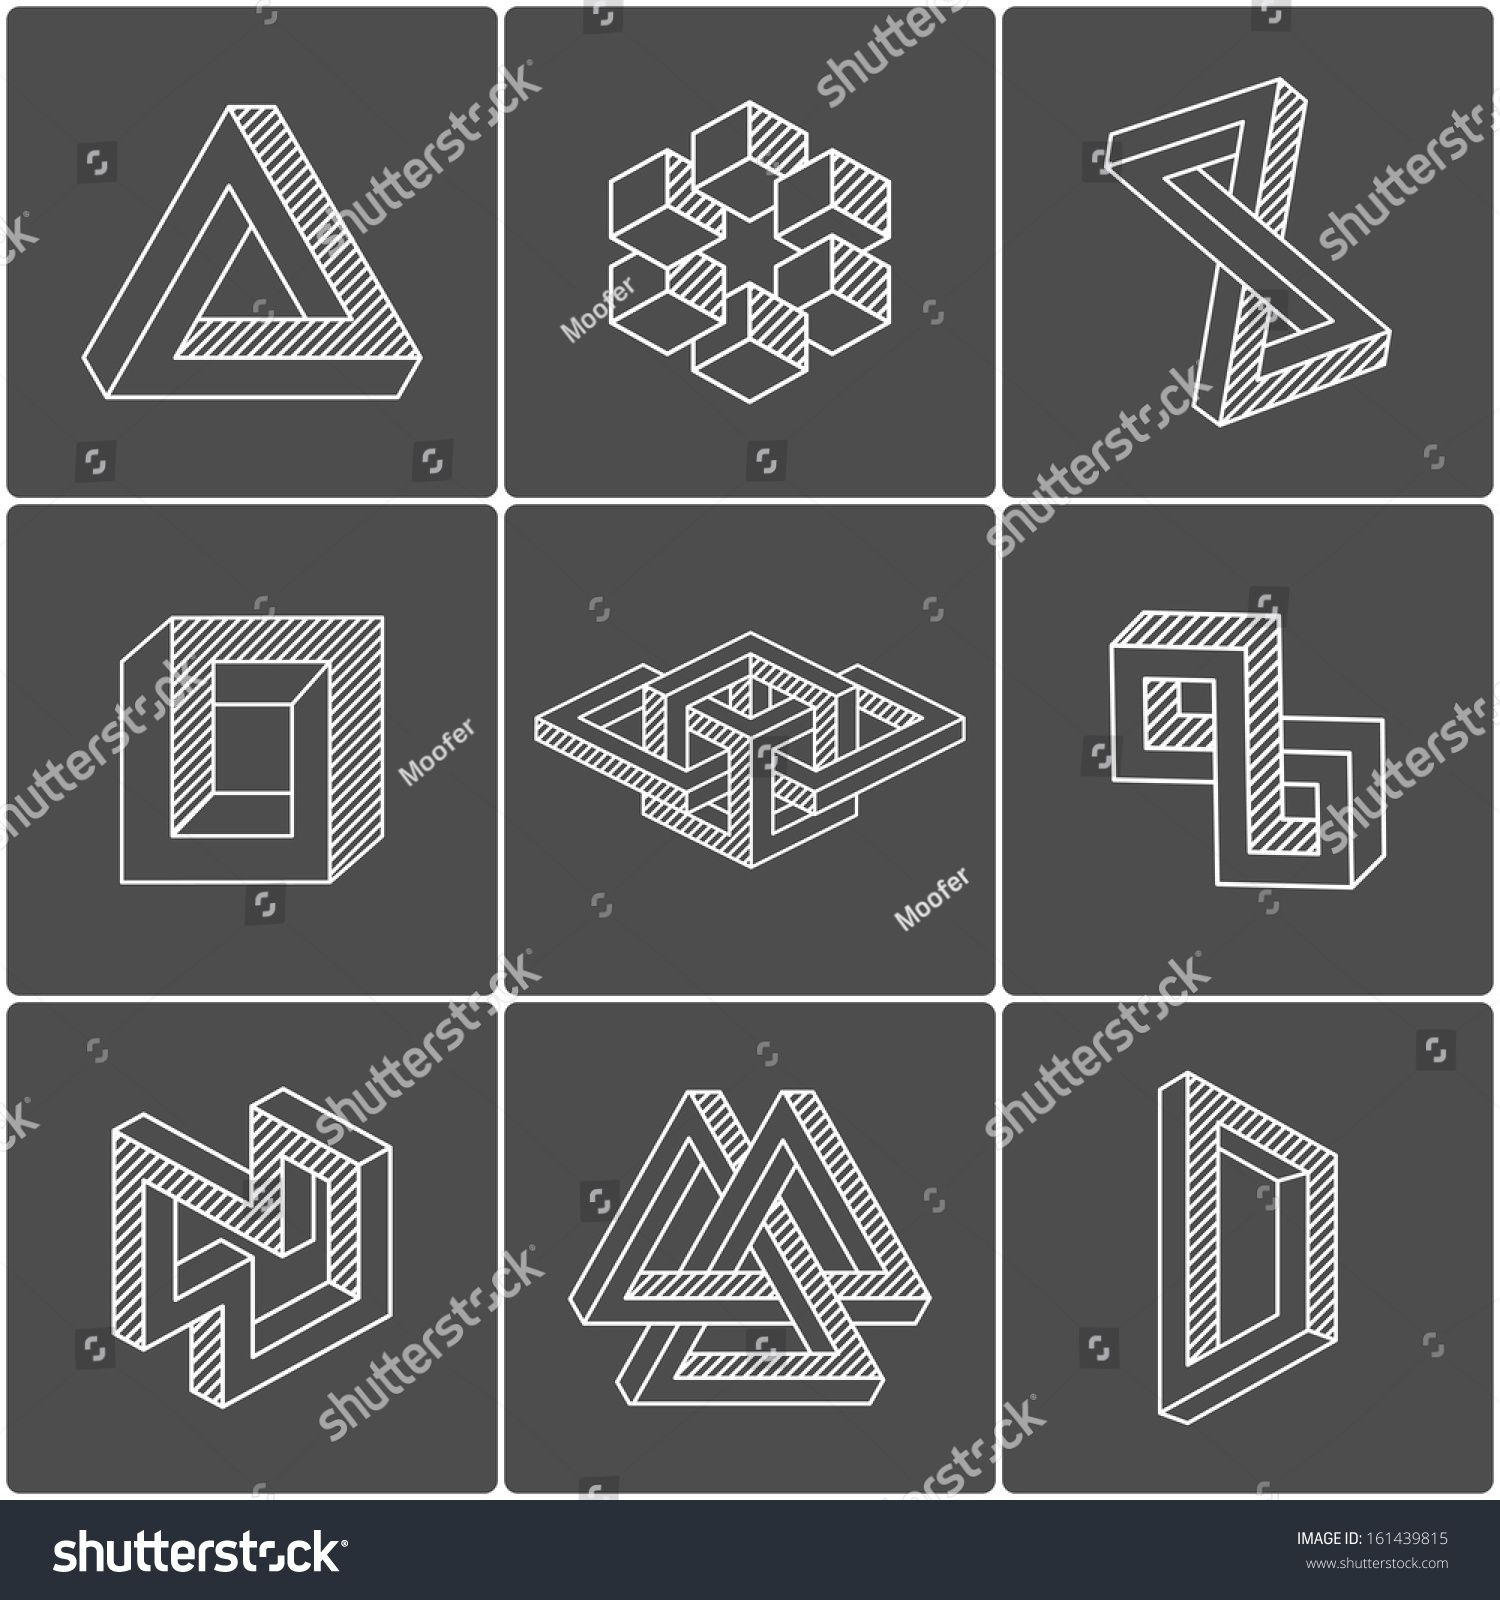 Geometric optical illusion shapes for logo or identity for Geometric illusion art